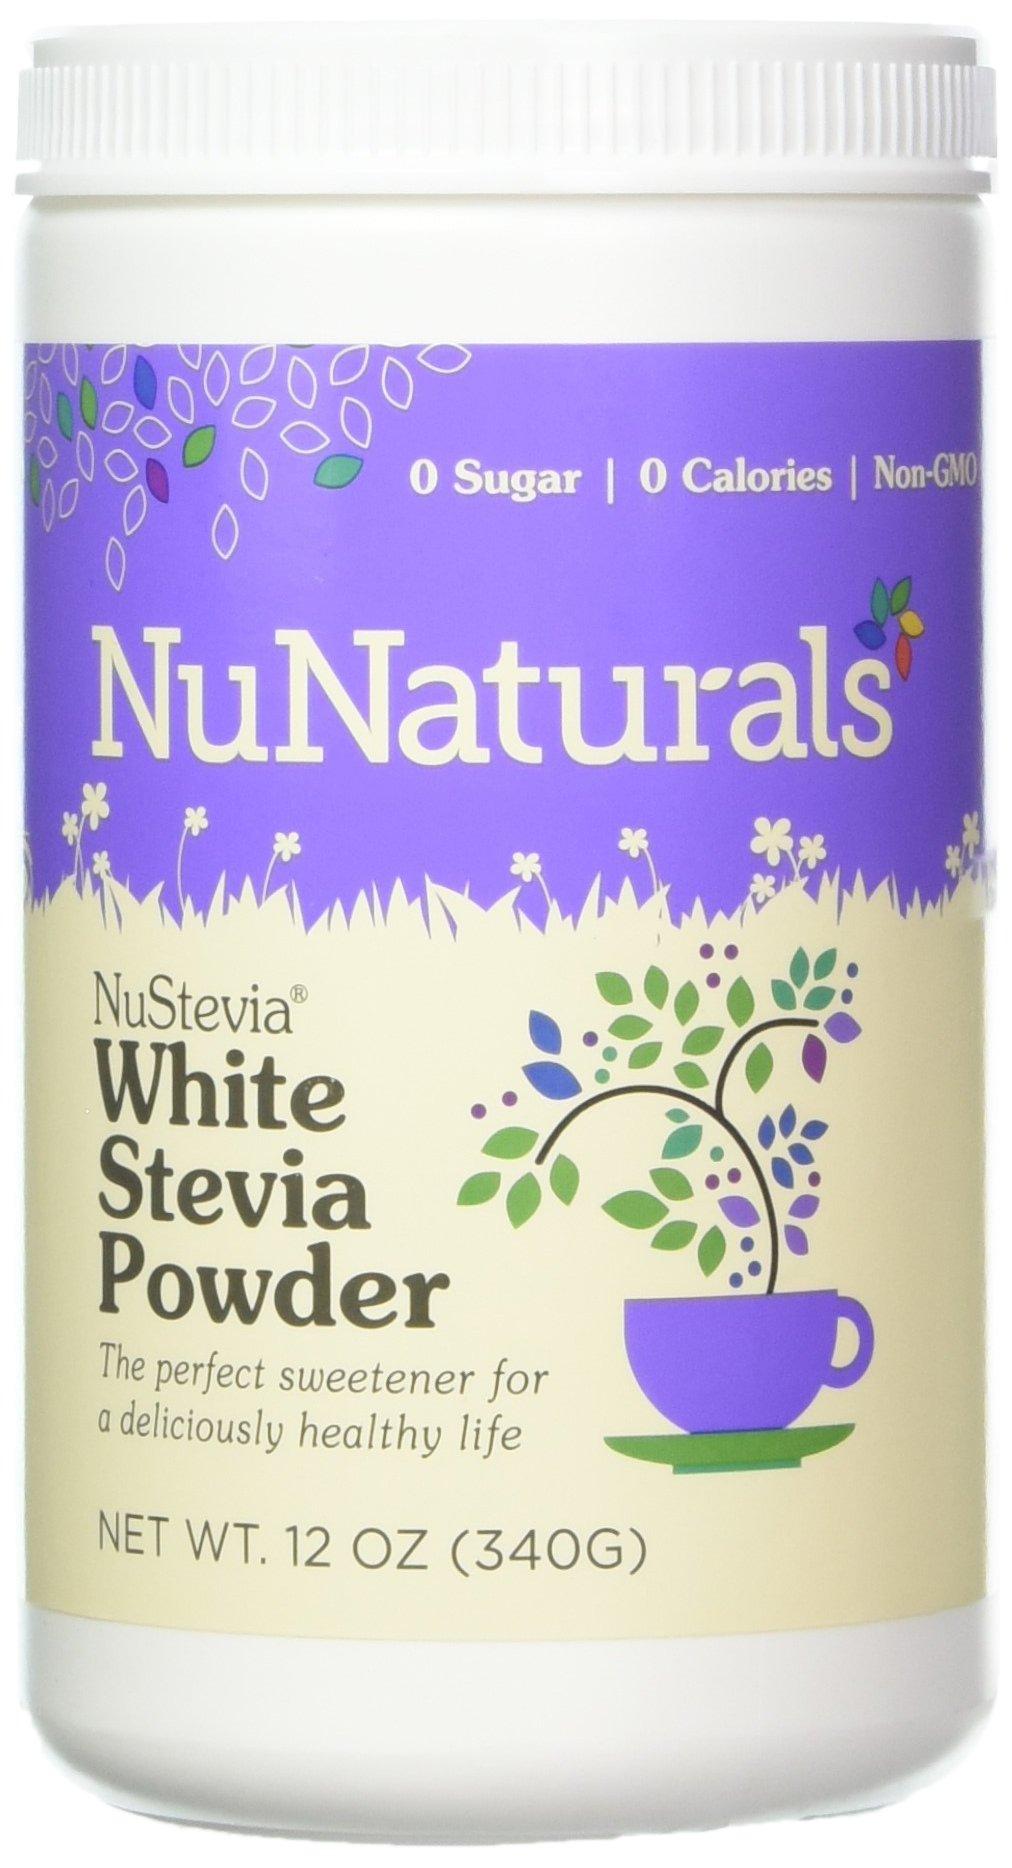 NuNaturals - NuStevia - White Stevia with Maltodextrin Powder - All-Purpose Sweetener - 12 Ounce